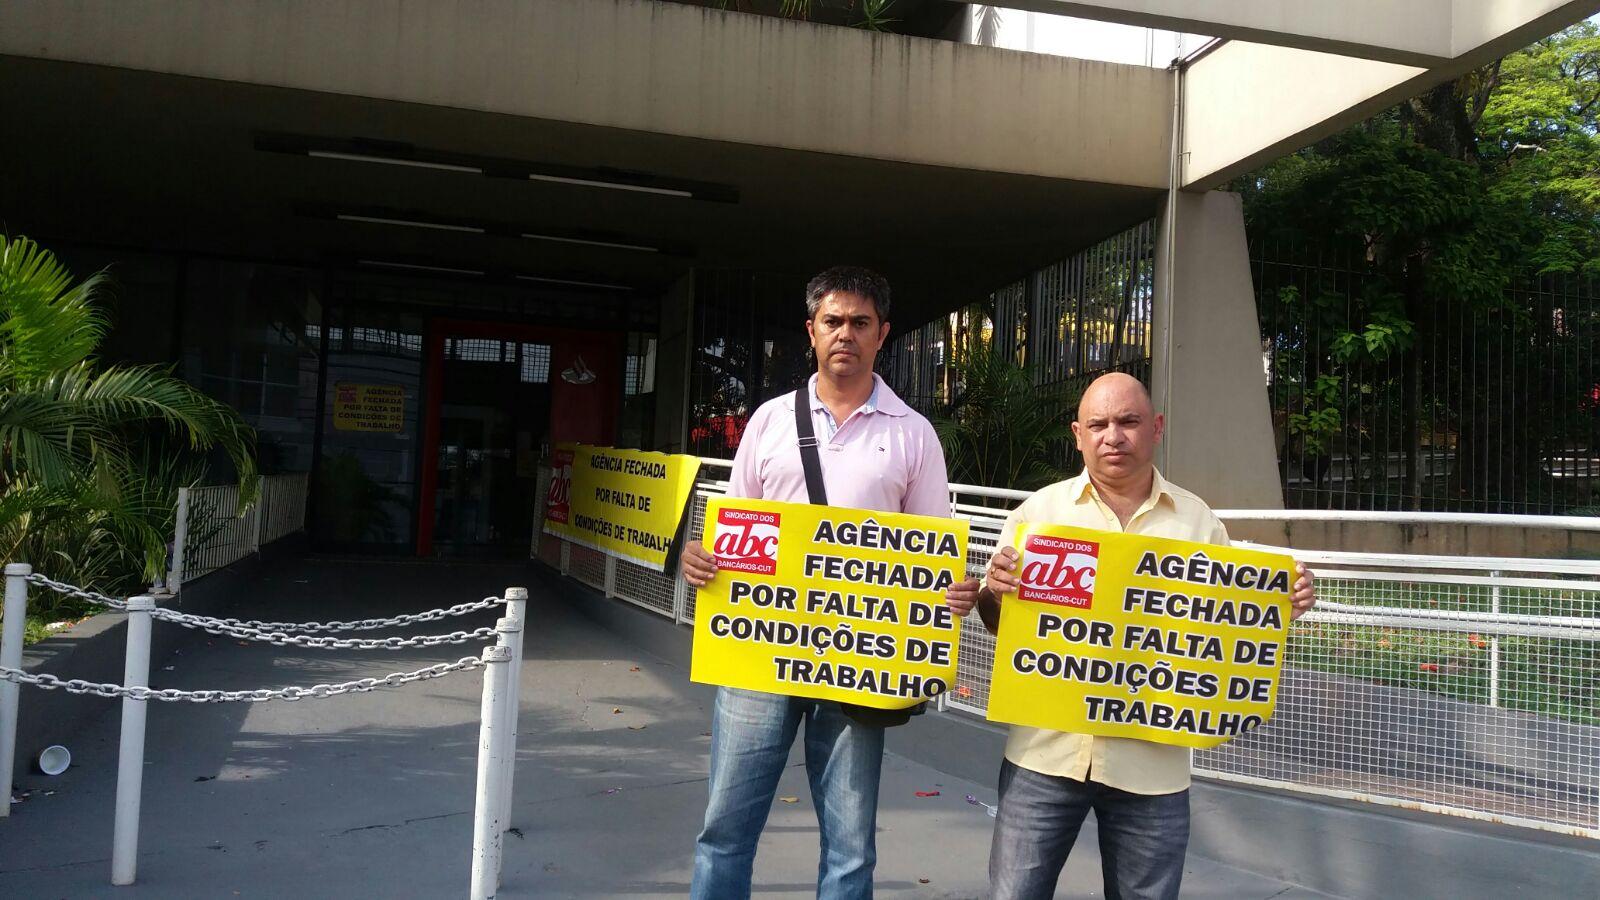 03-09-2016 Atividade Santander REgional SBC (2)